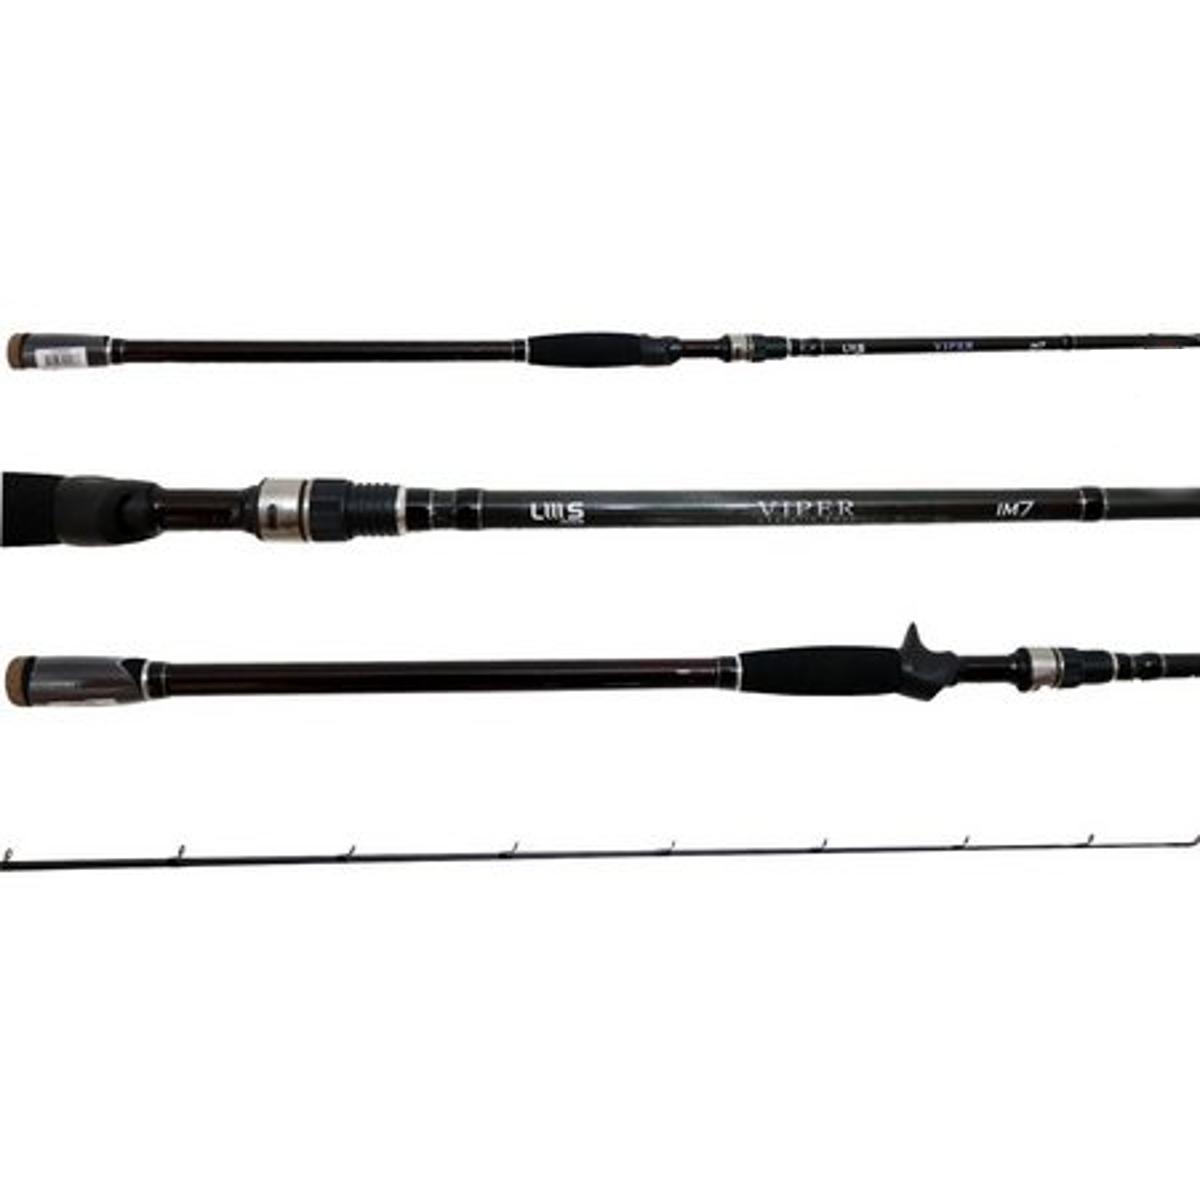 Vara Lumis Viper 602 (1,83m) 6-17lb Carretilha 2 Partes  - Pesca Adventure